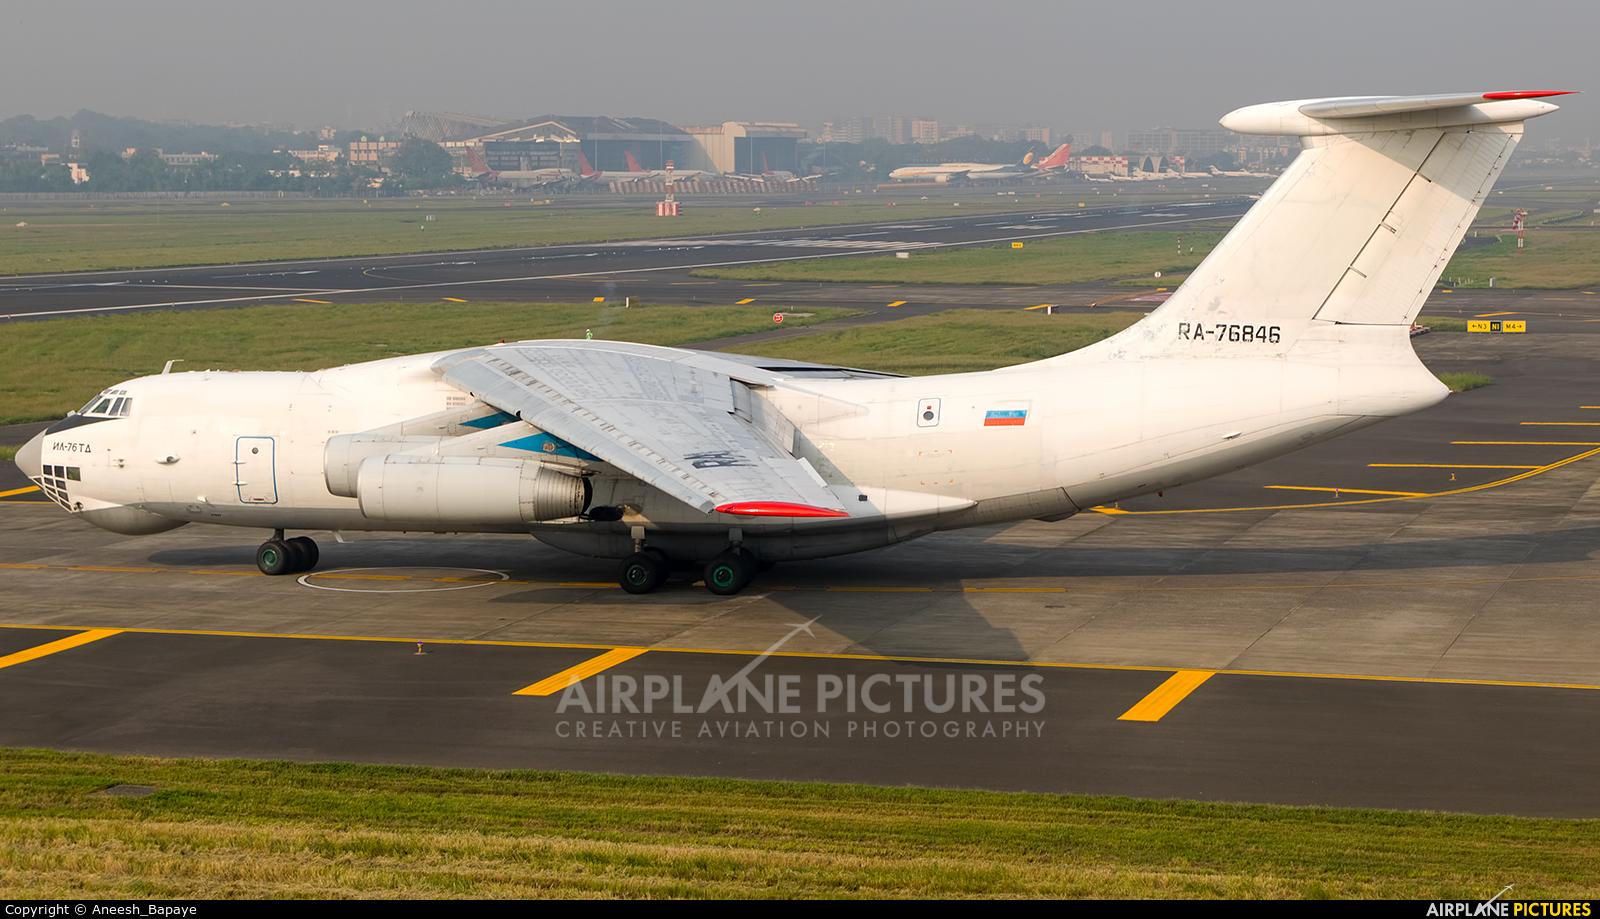 Aviacon Zitotrans RA-76846 aircraft at Mumbai - Chhatrapati Shivaji Intl